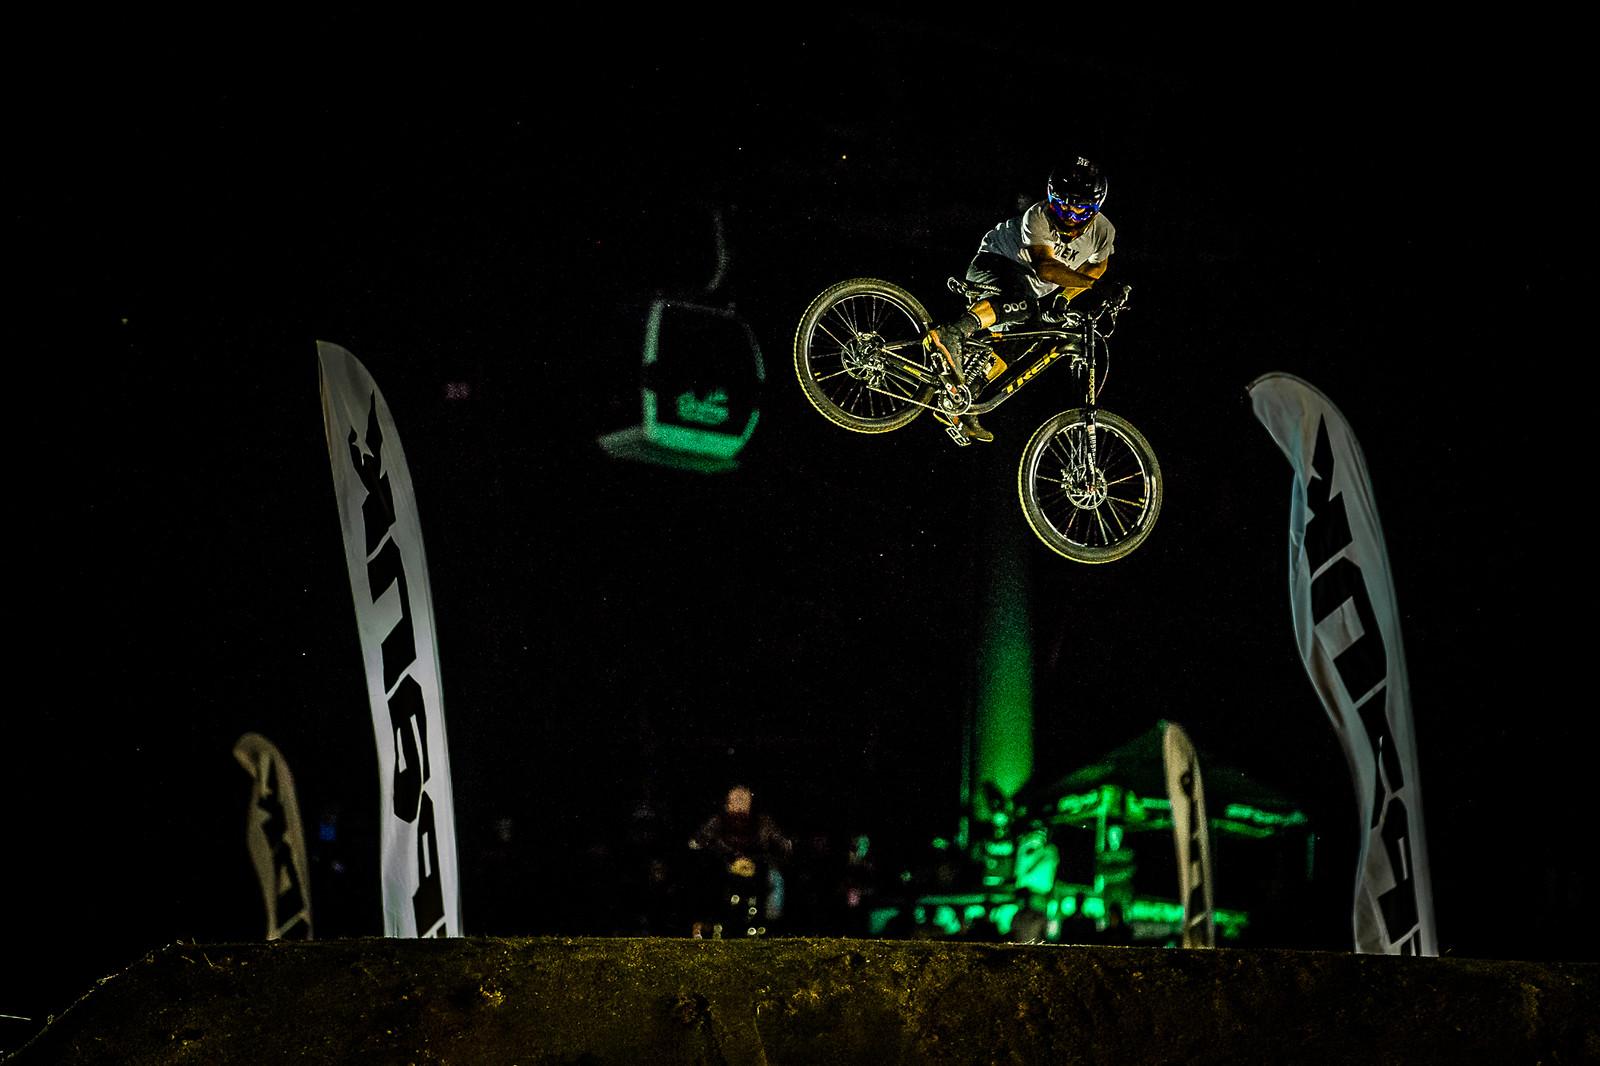 Cworx Rotorua N3X0898  - Spank Industries - Mountain Biking Pictures - Vital MTB